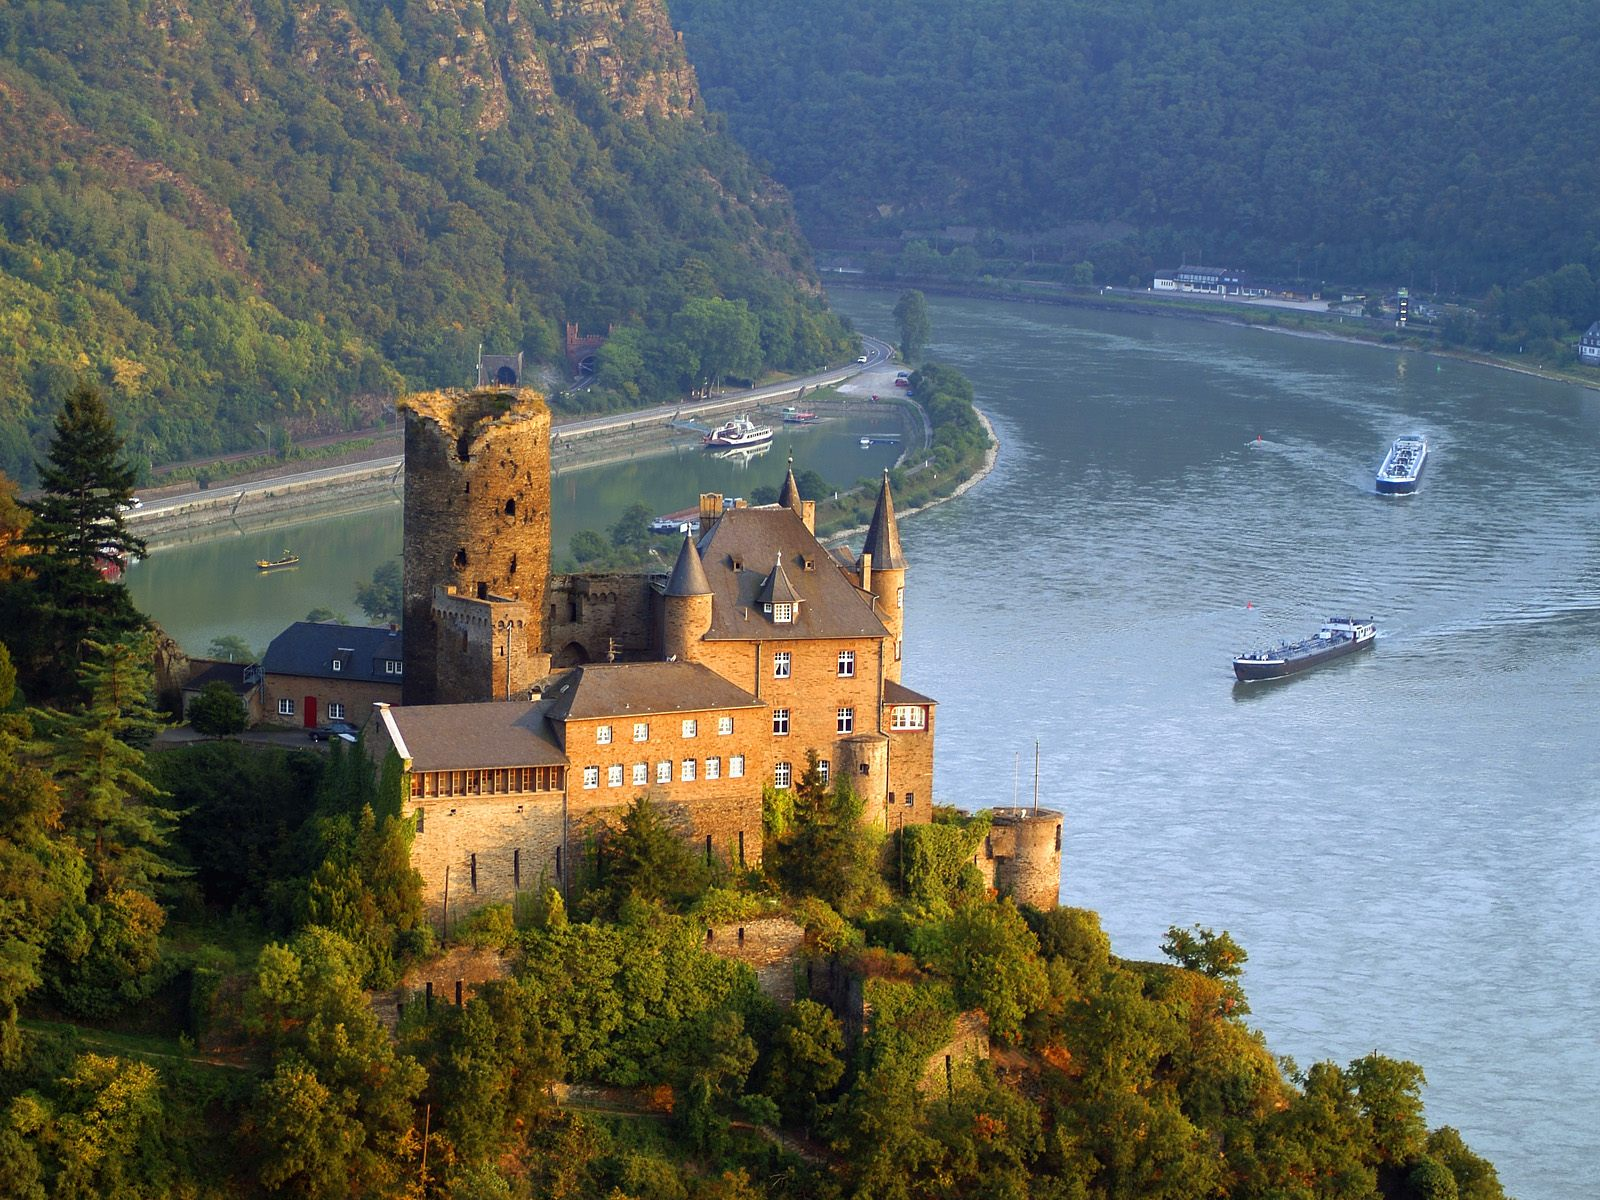 Wonderful Rhine River Wallpaper   HD Wallpapers 1600x1200